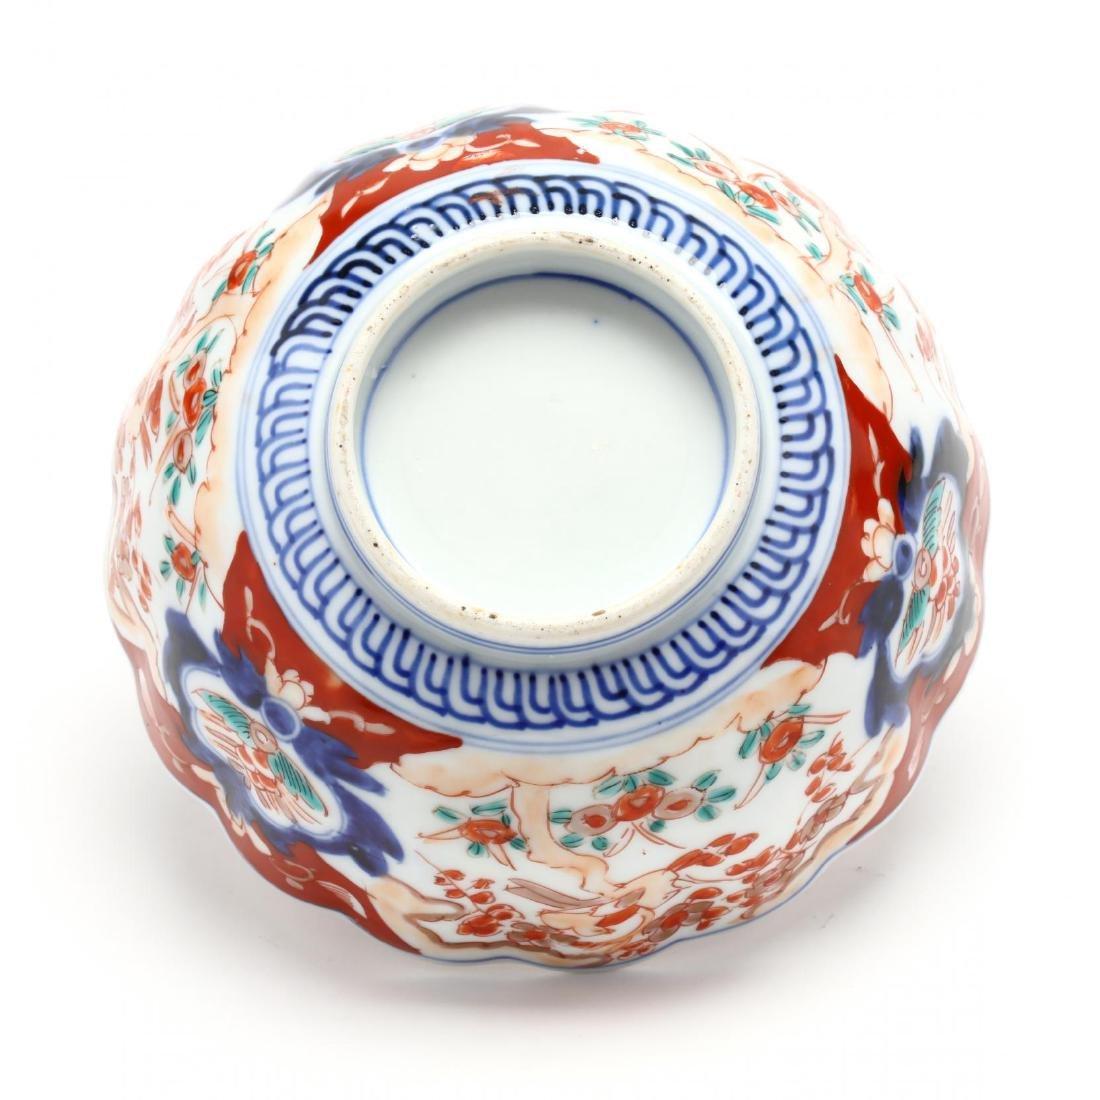 A Group of Imari Porcelain - 7